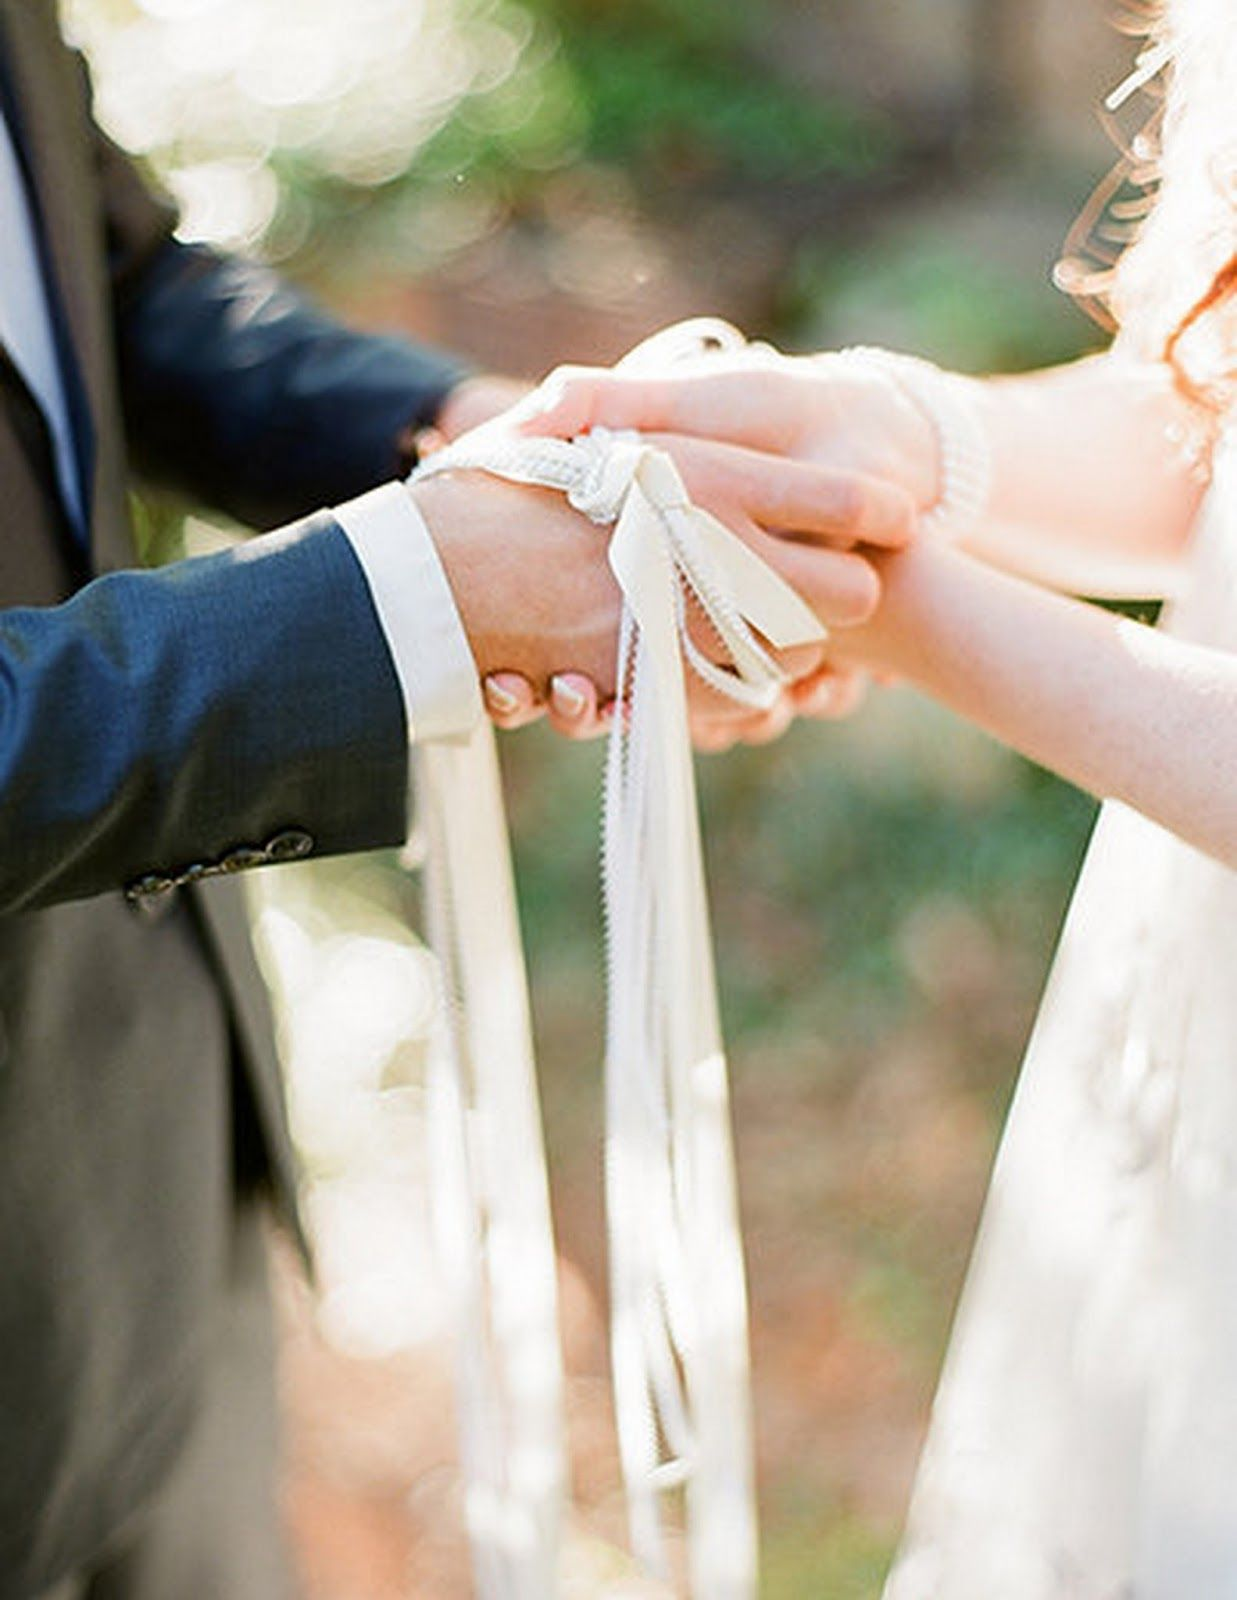 Irish Wedding Traditions Hand Fasting Wedding Ceremony Traditions Irish Wedding Traditions Wedding Ceremony Script